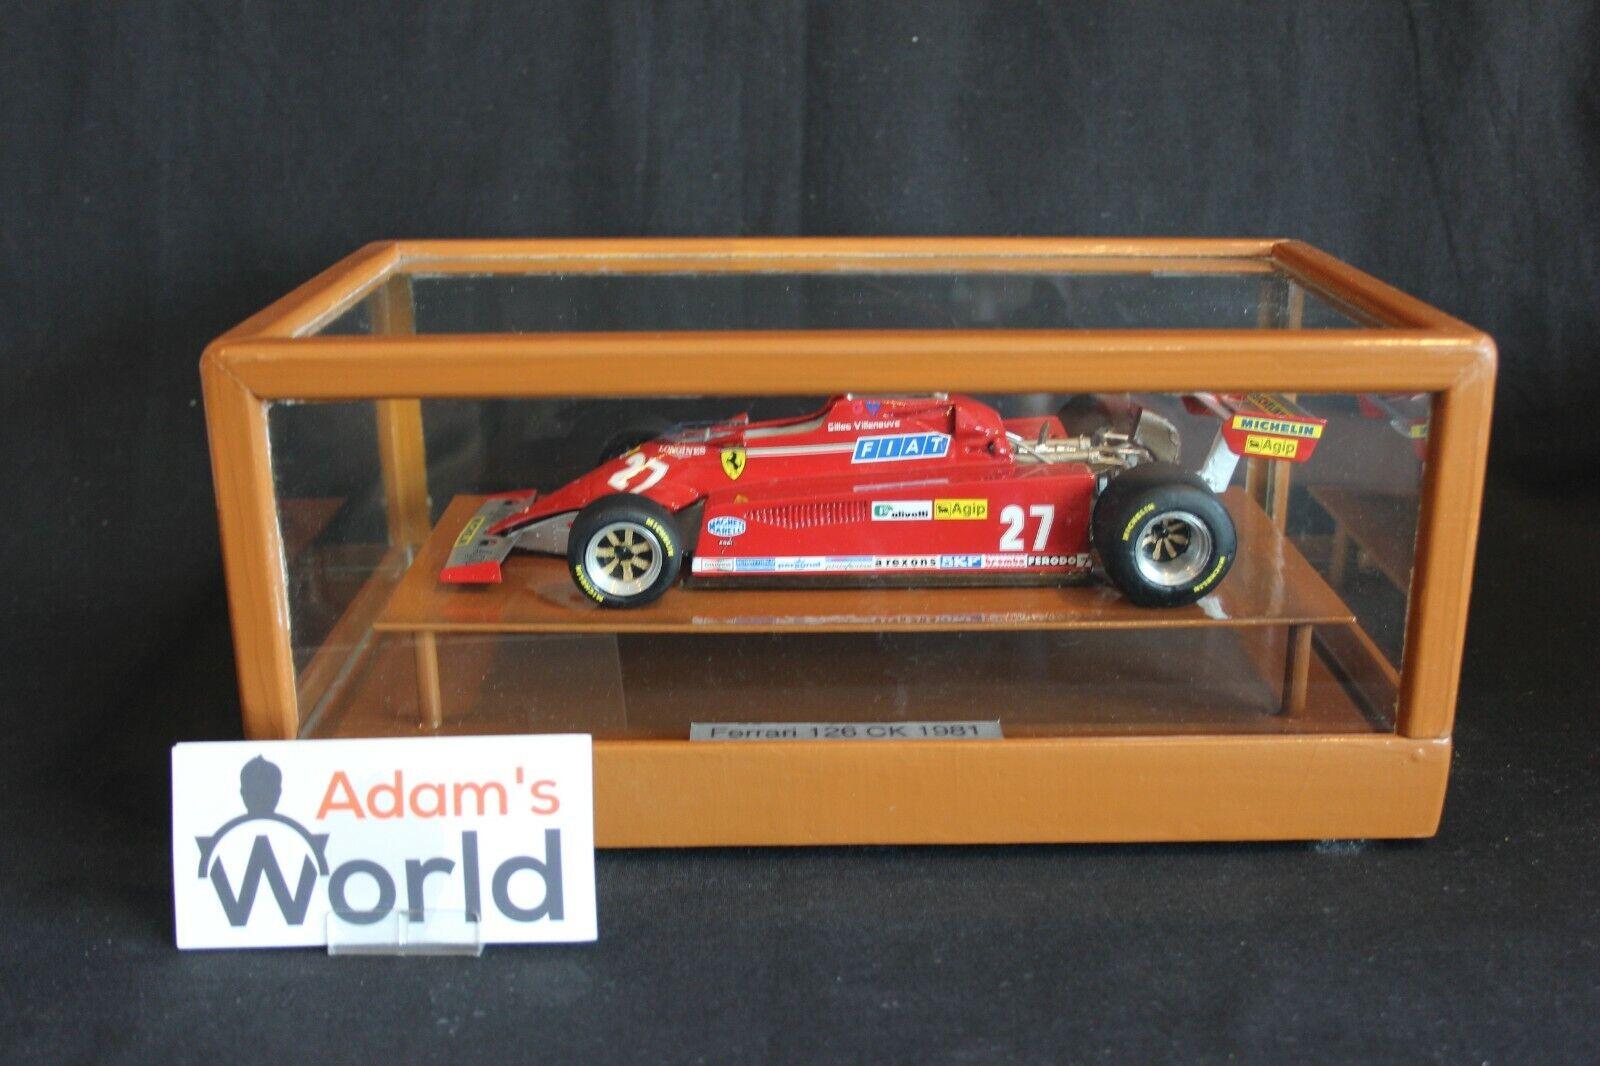 Matilde Model Ferrari 126 CK 1981 1 18 Gilles Villeneuve in show case (PJBB)